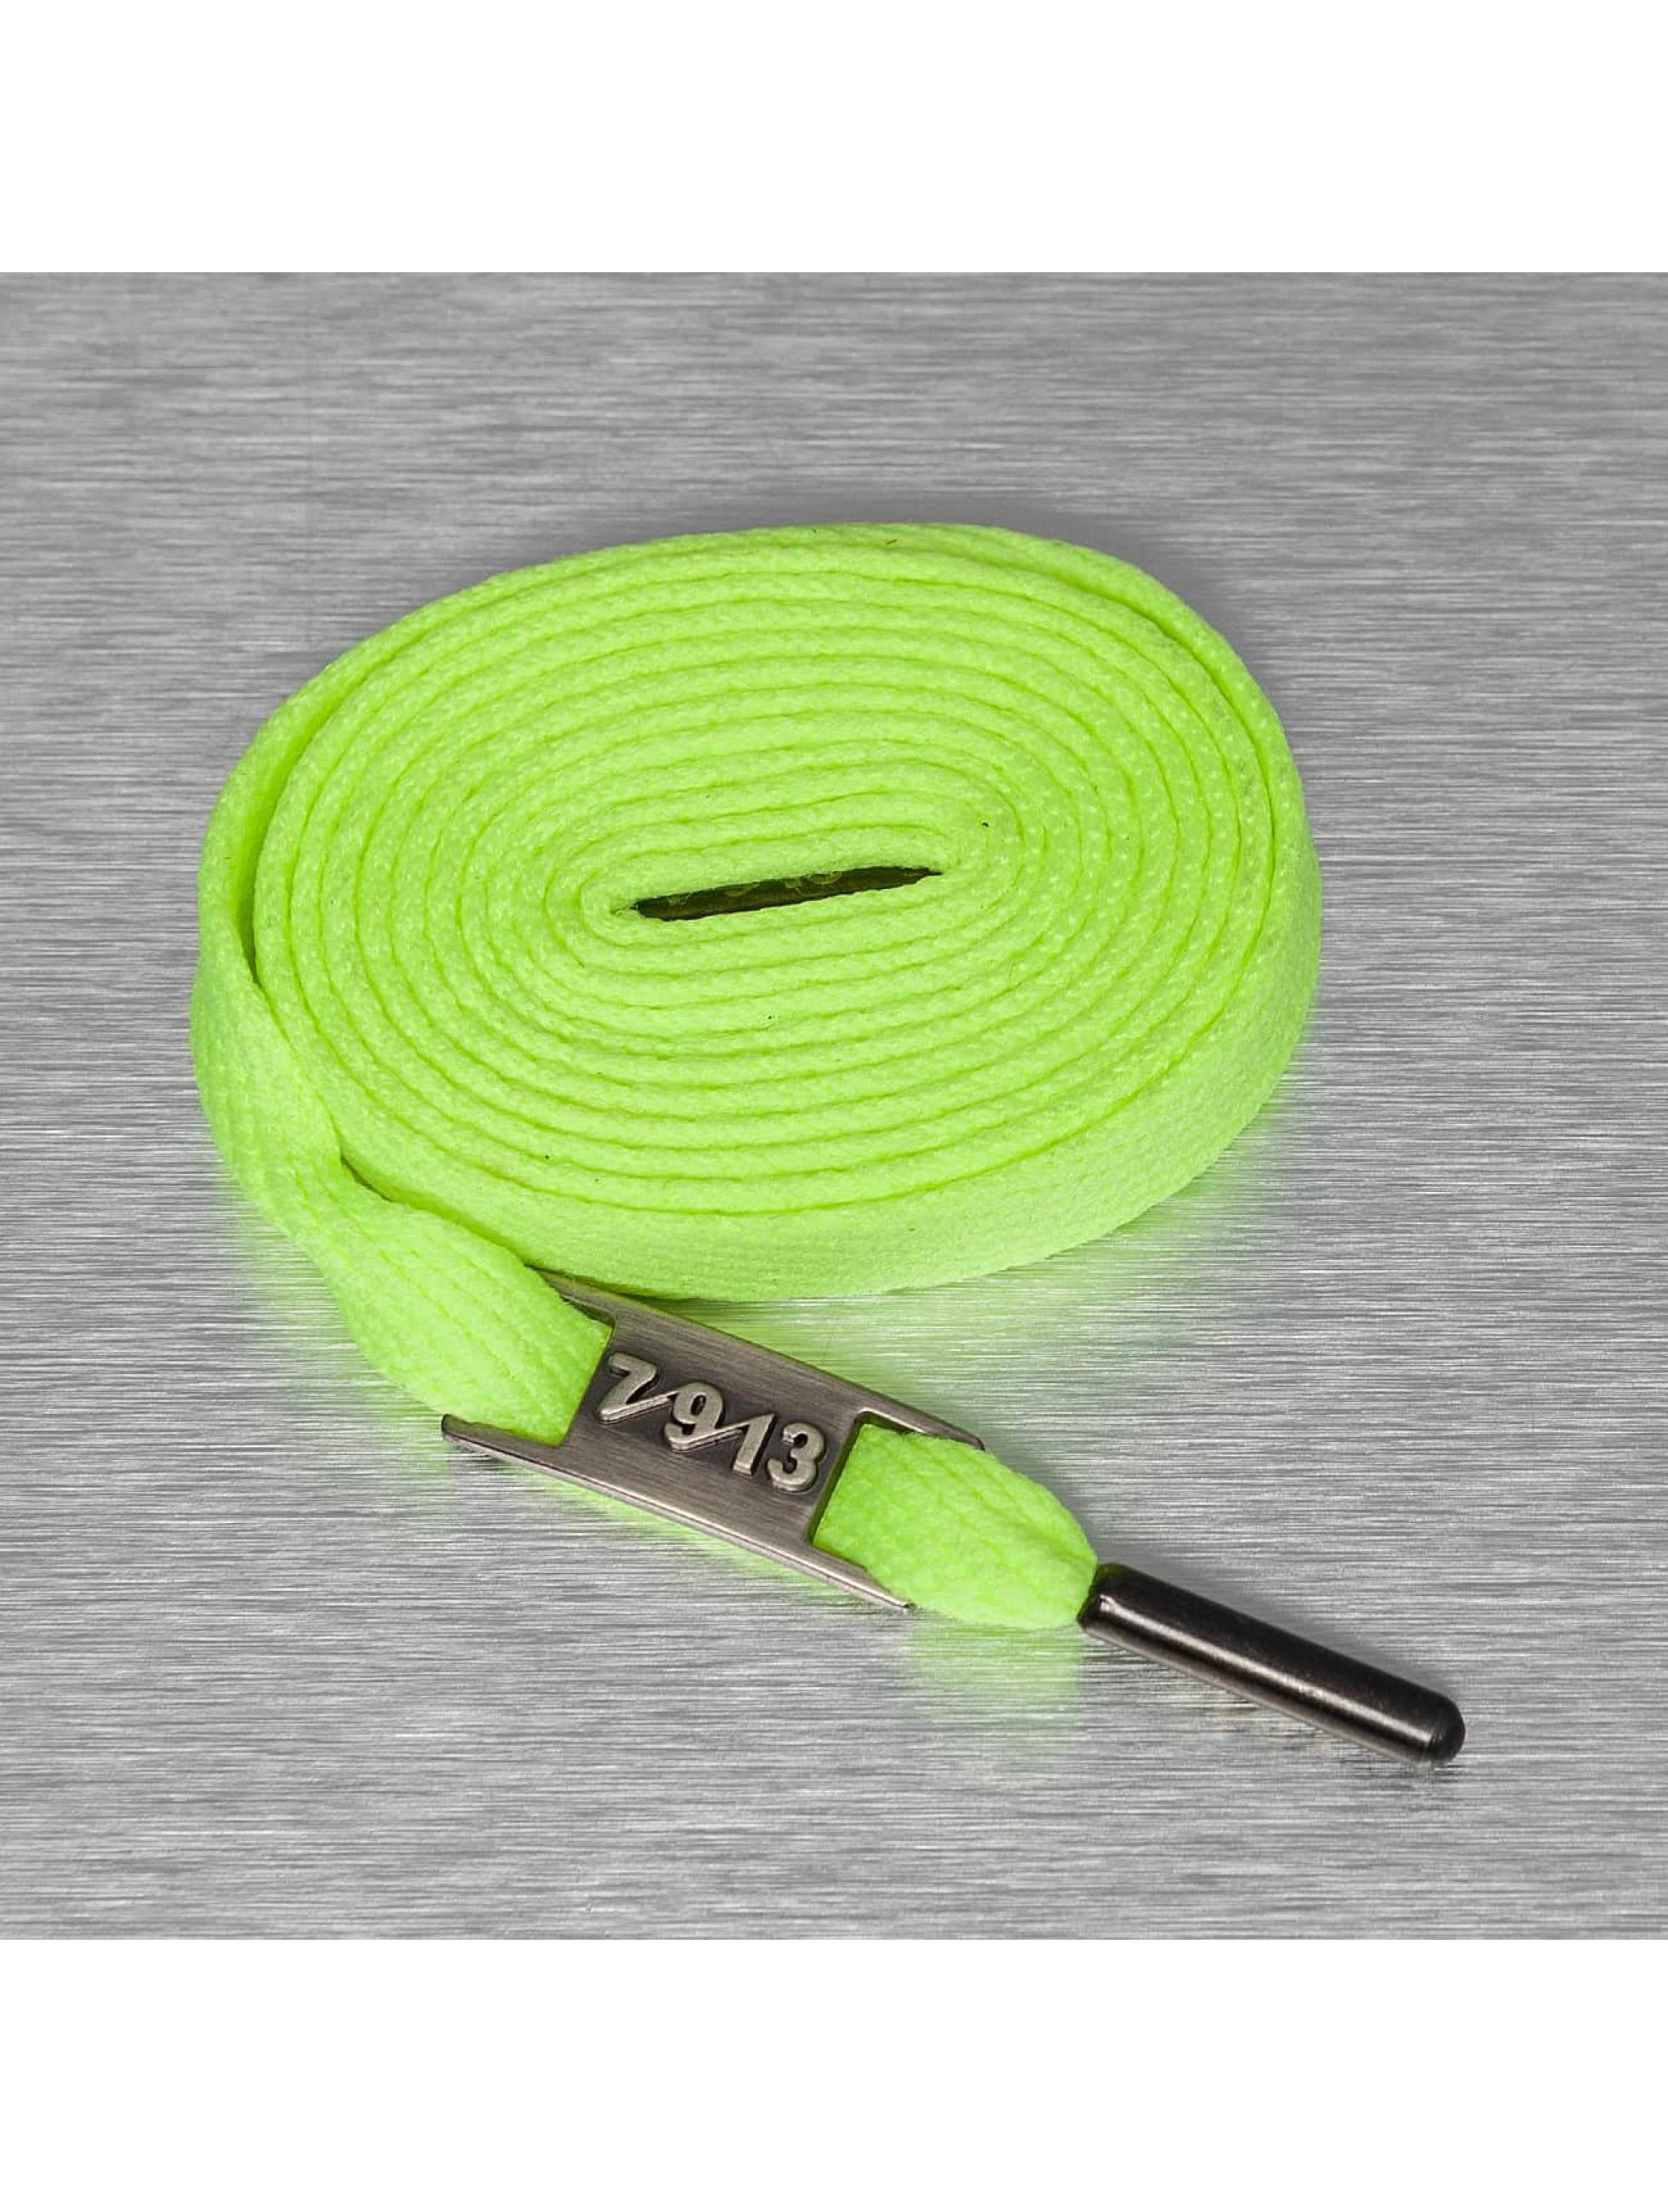 Seven Nine 13 Shoelace Full Metal green